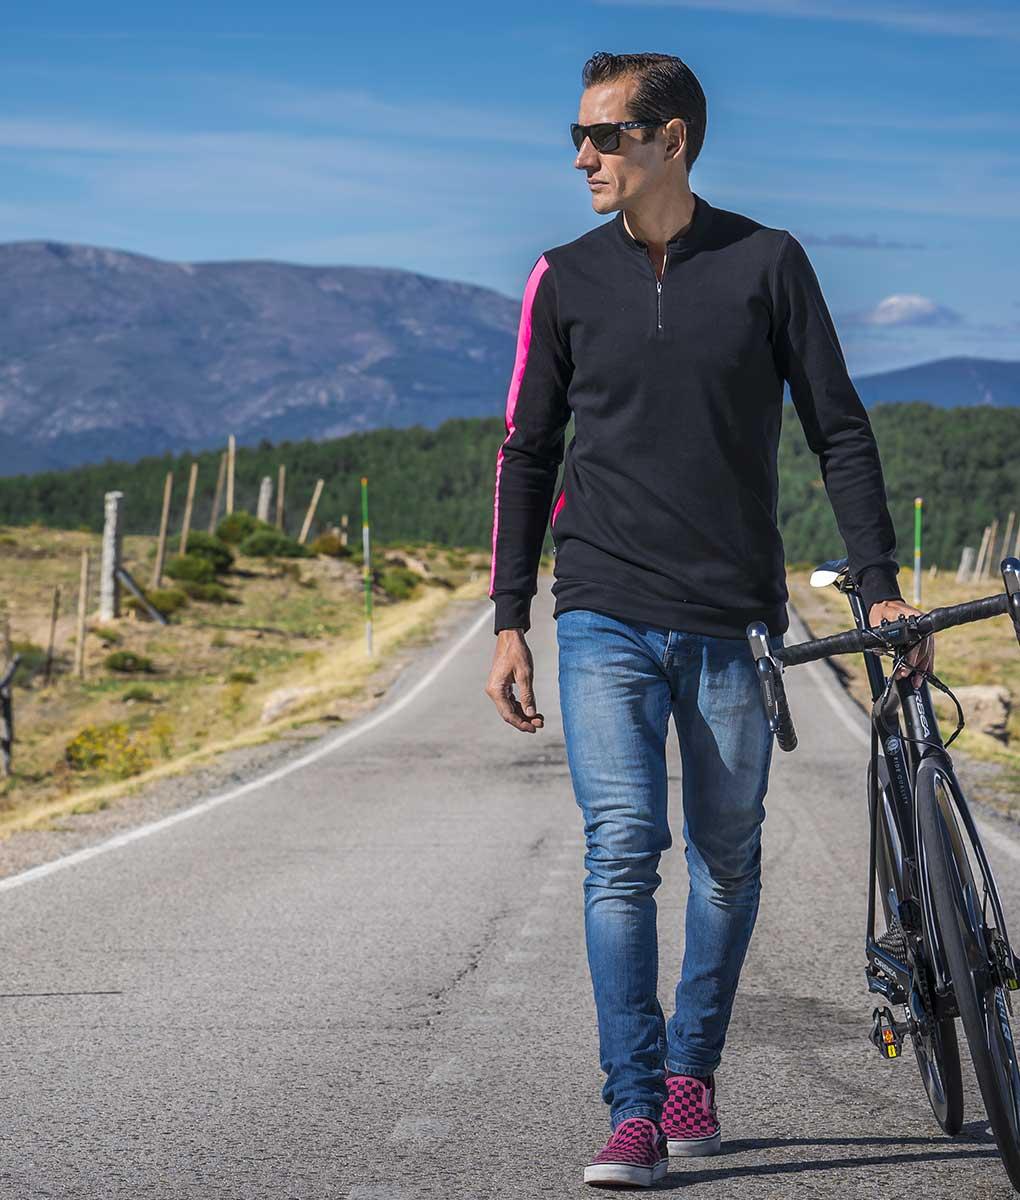 casual-cycling-sweater-fluor-pink-bike